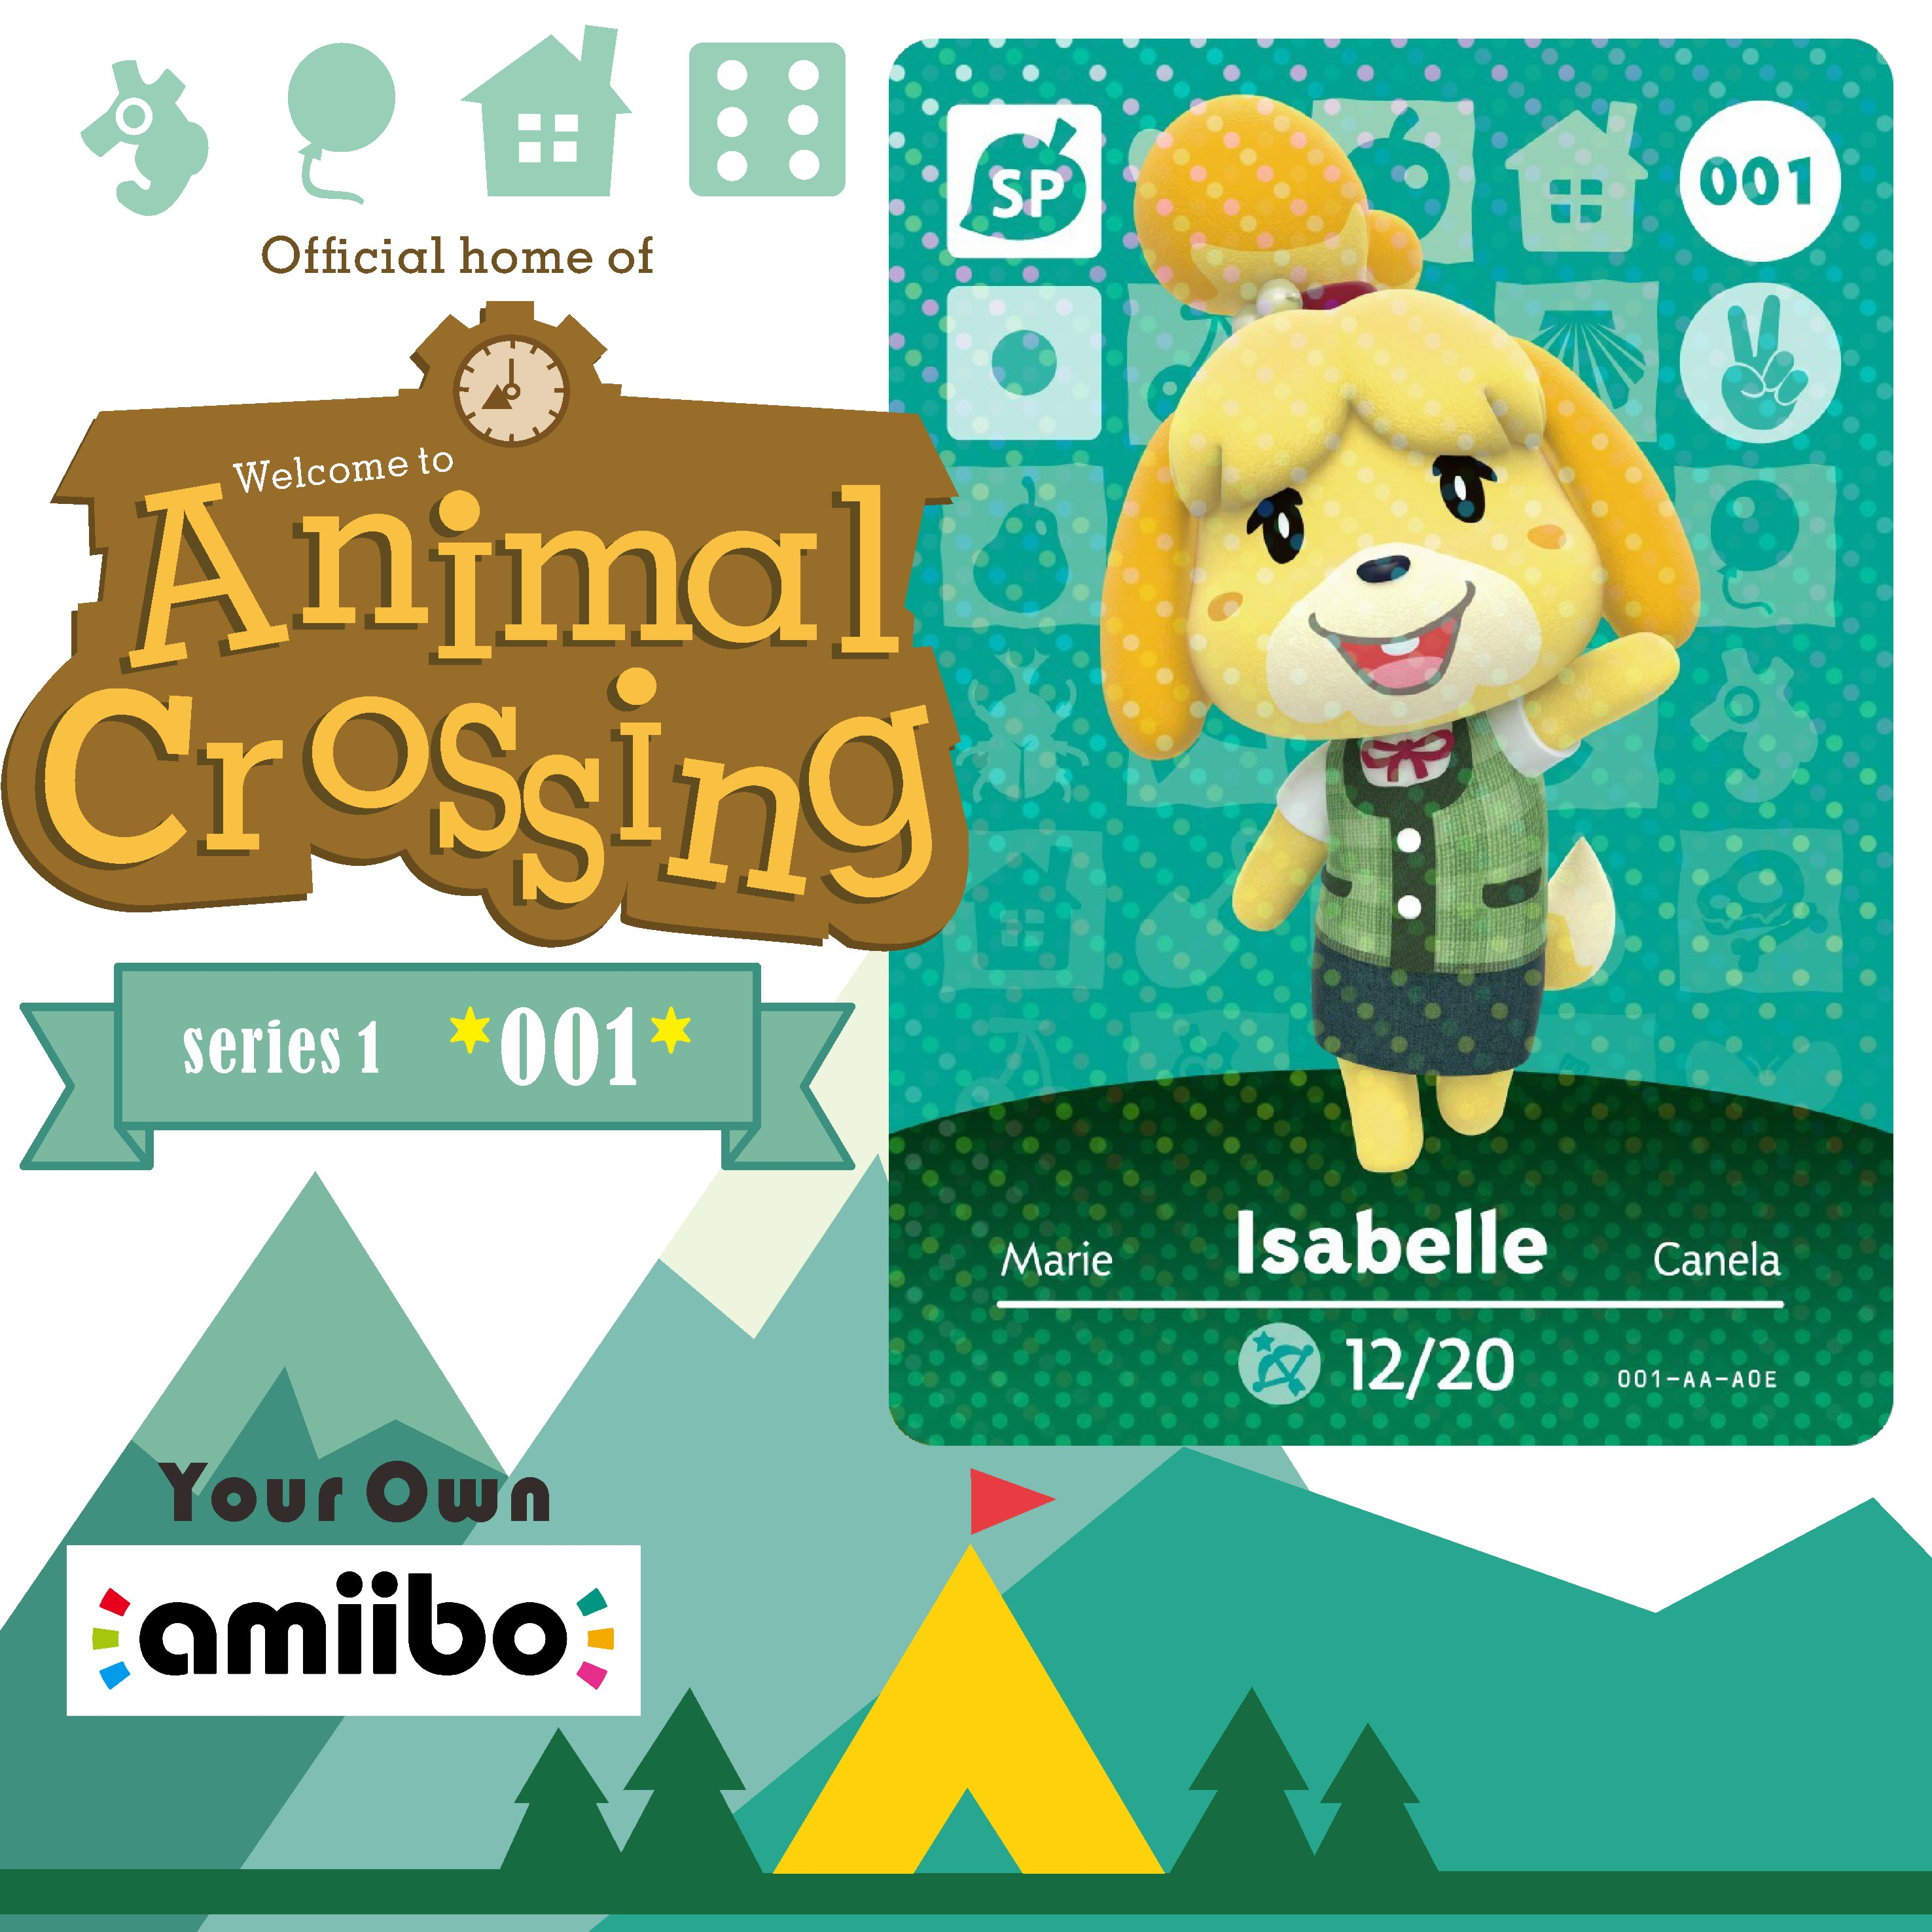 Welcome Amiibo Card Cards Animal Crossing Isabelle Isabel Animal Crossing Amiibo Card Series 1 Amino Cards for Animal Crossing 2